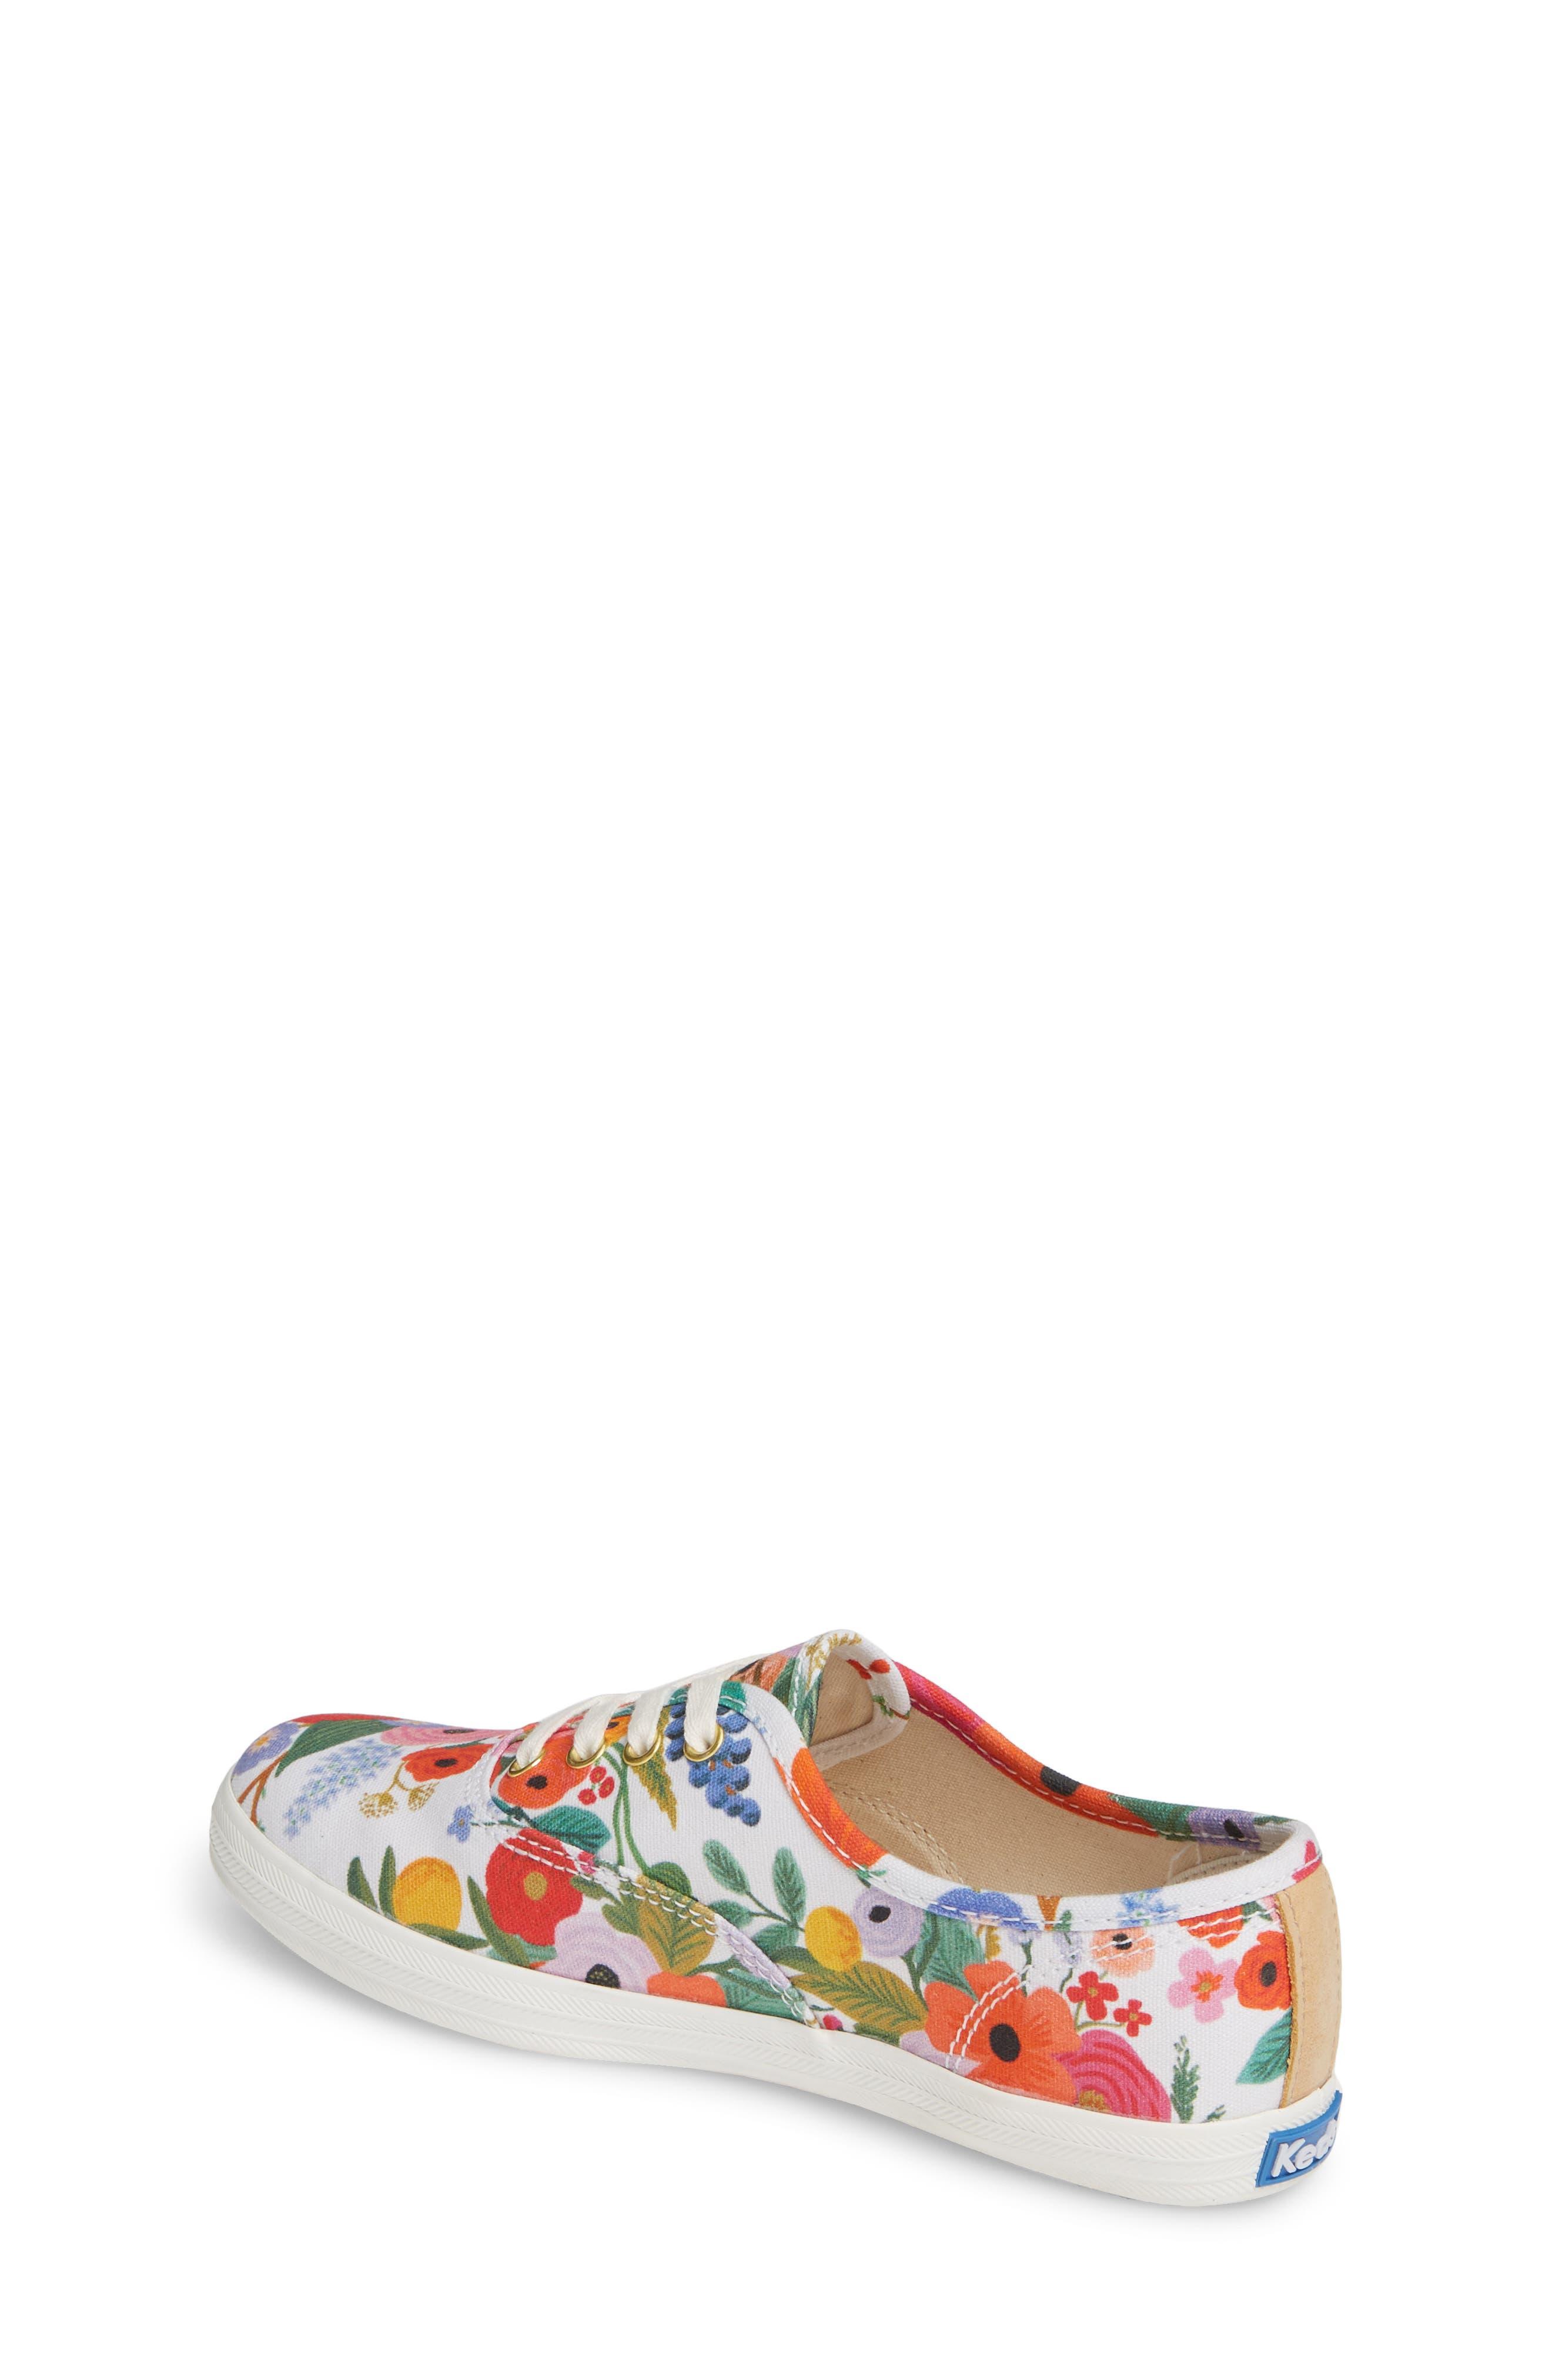 KEDS<SUP>®</SUP>, x Rifle Paper Co. Floral Print Champion Sneaker, Alternate thumbnail 2, color, GARDEN PARTY